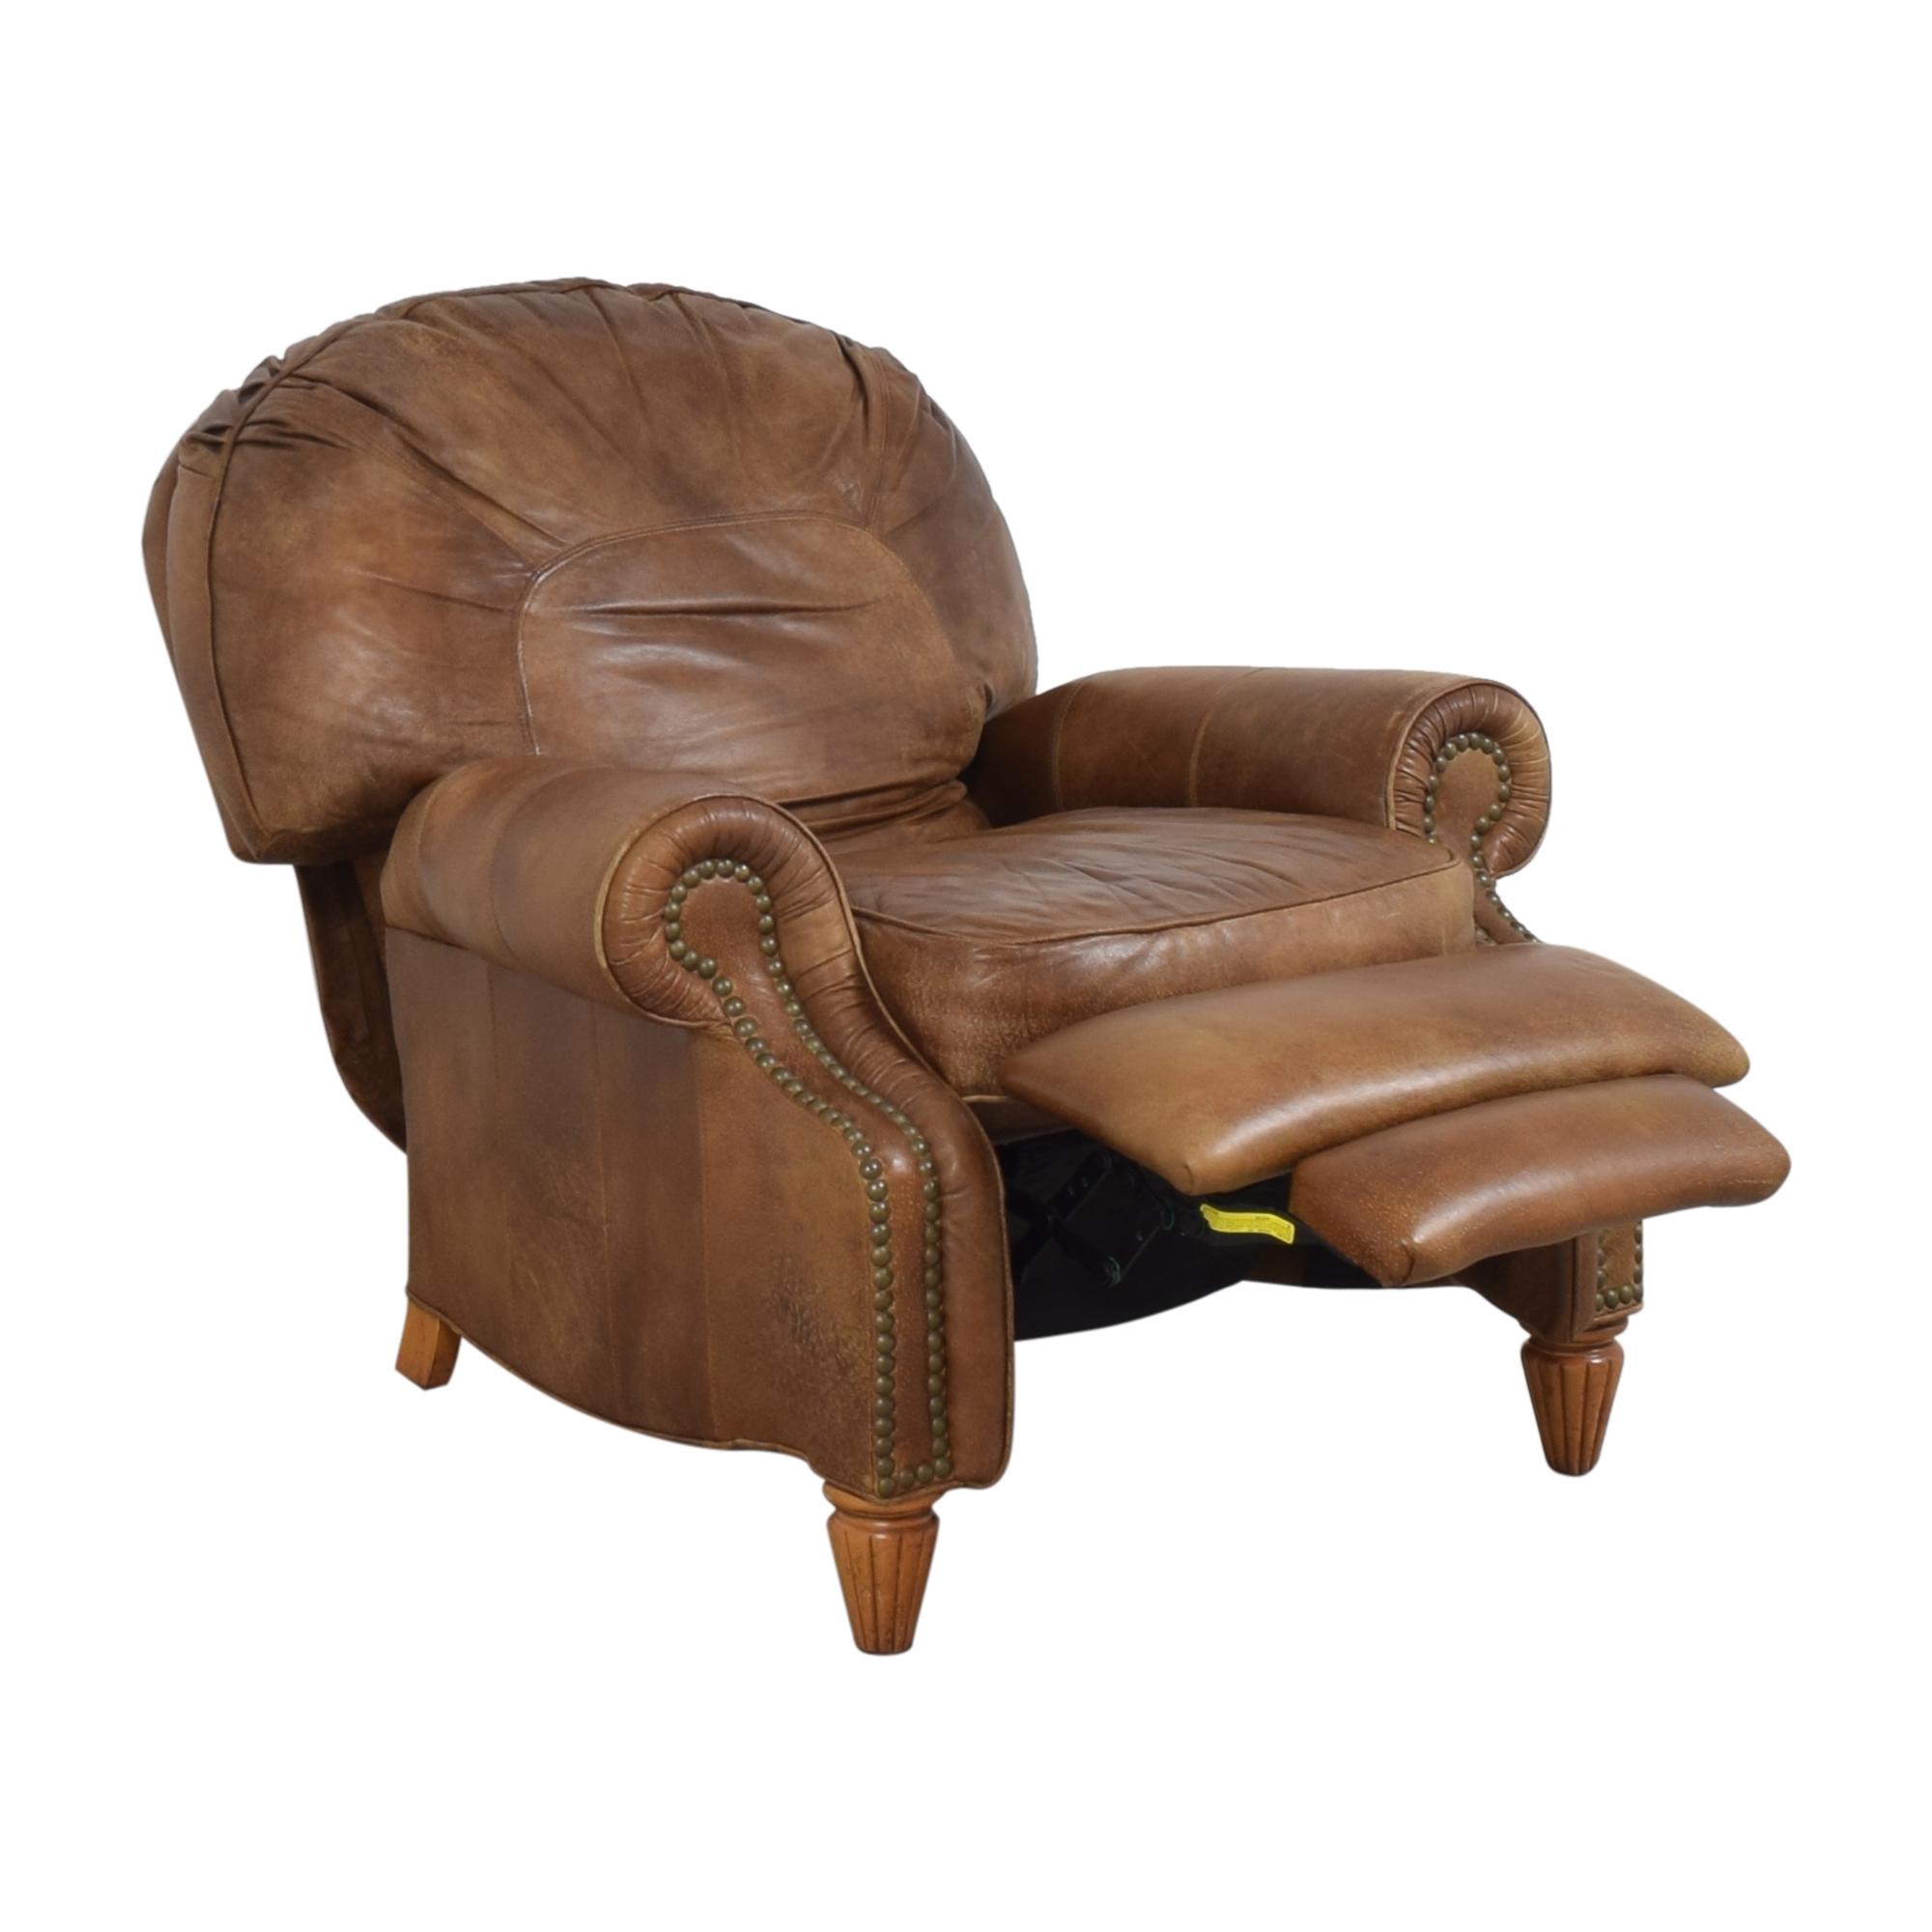 Thomasville Thomasville Leather Morgan Recliner brown